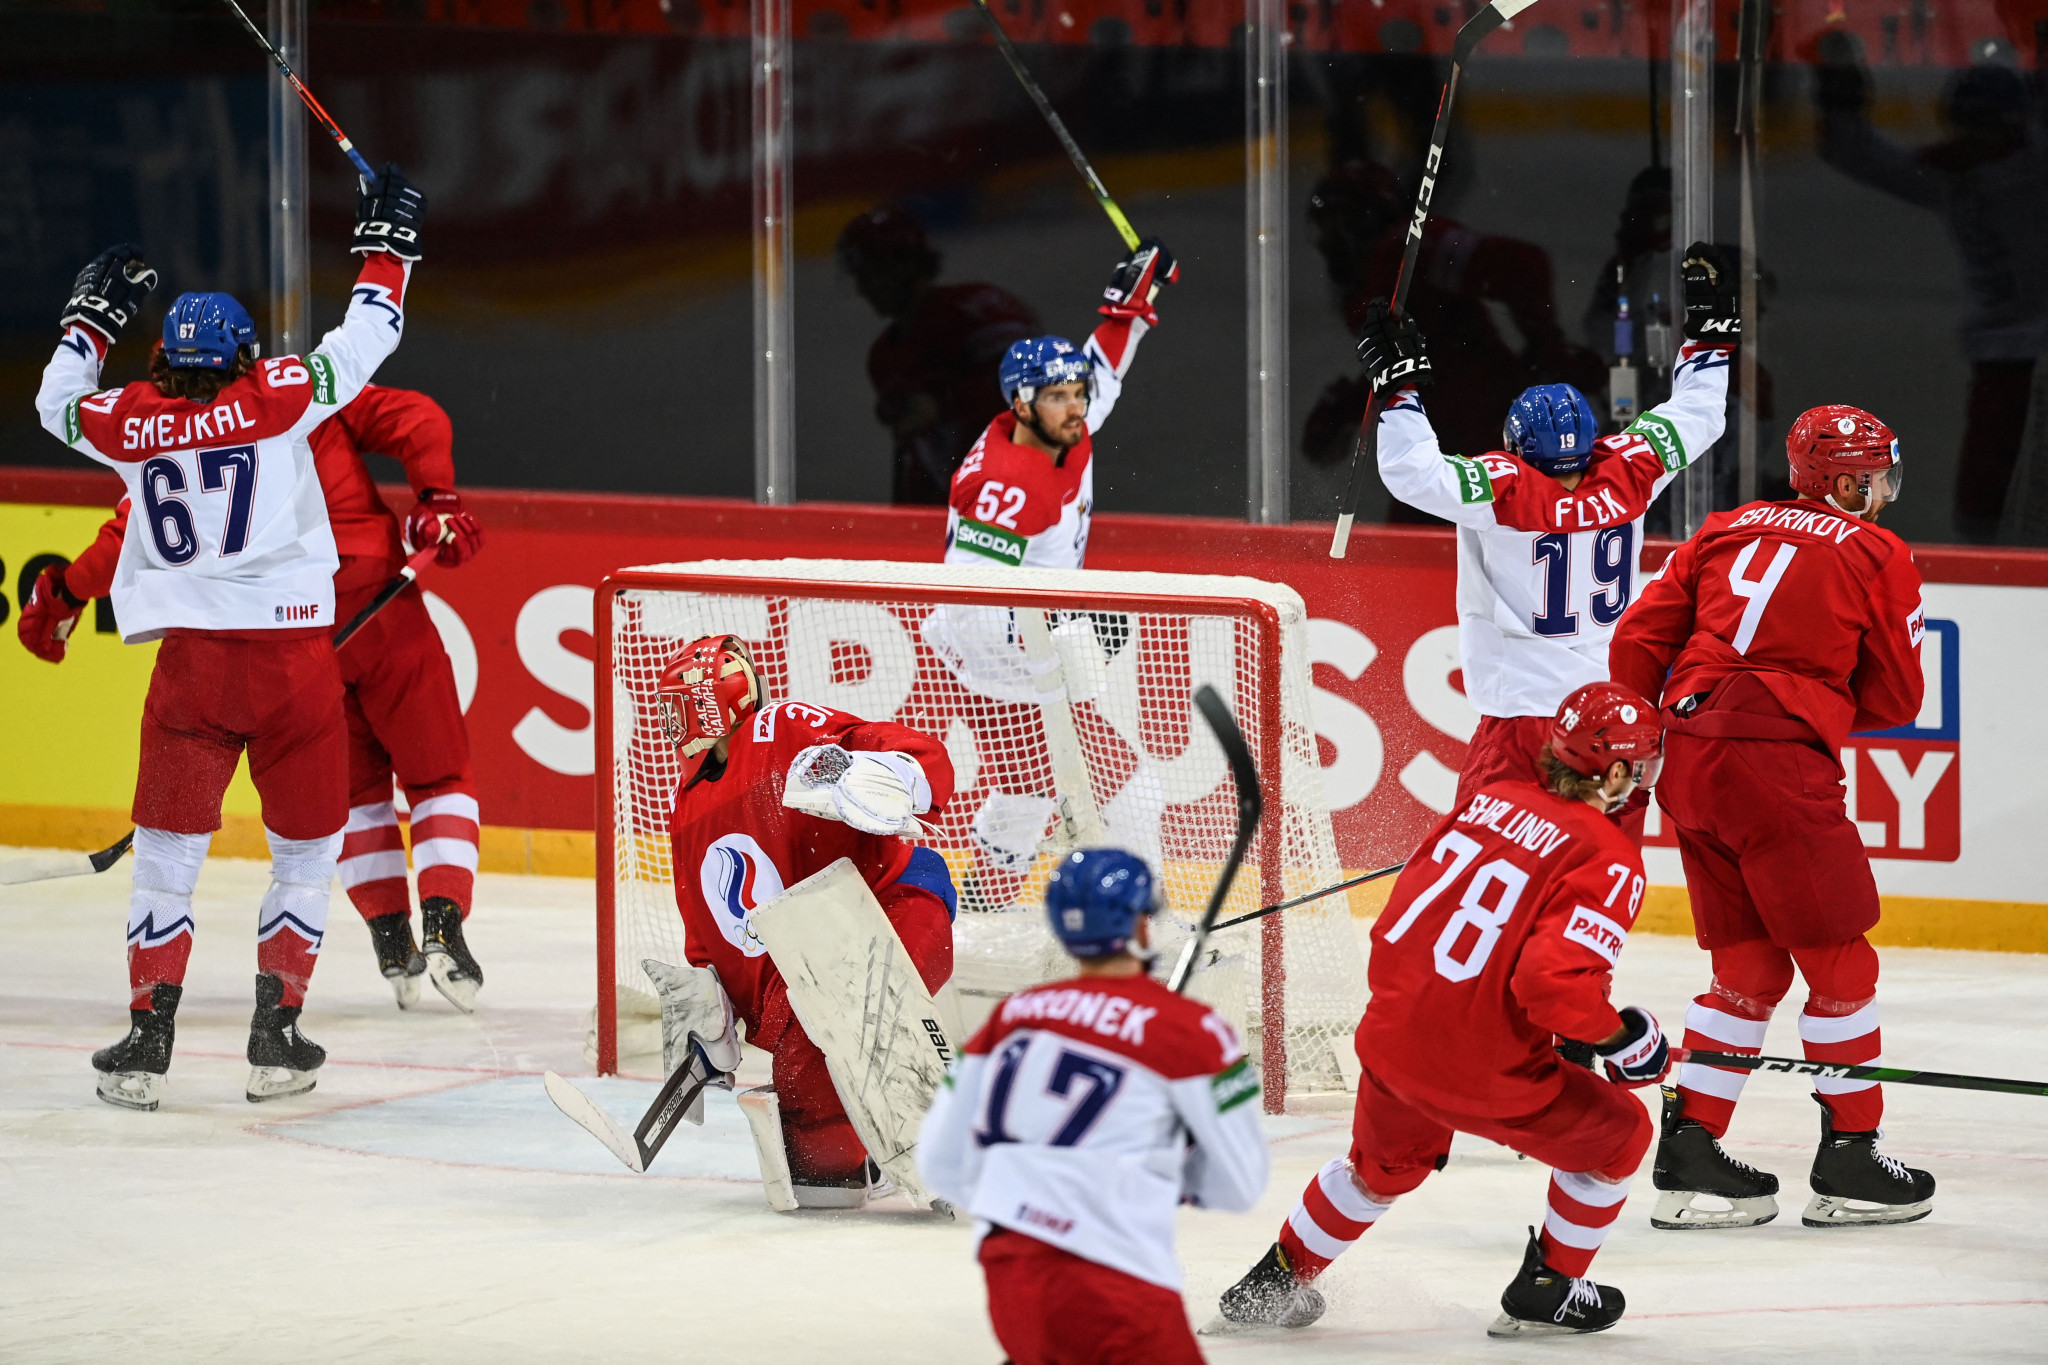 IIHF reports one positive from 2,750 coronavirus tests at World Championship